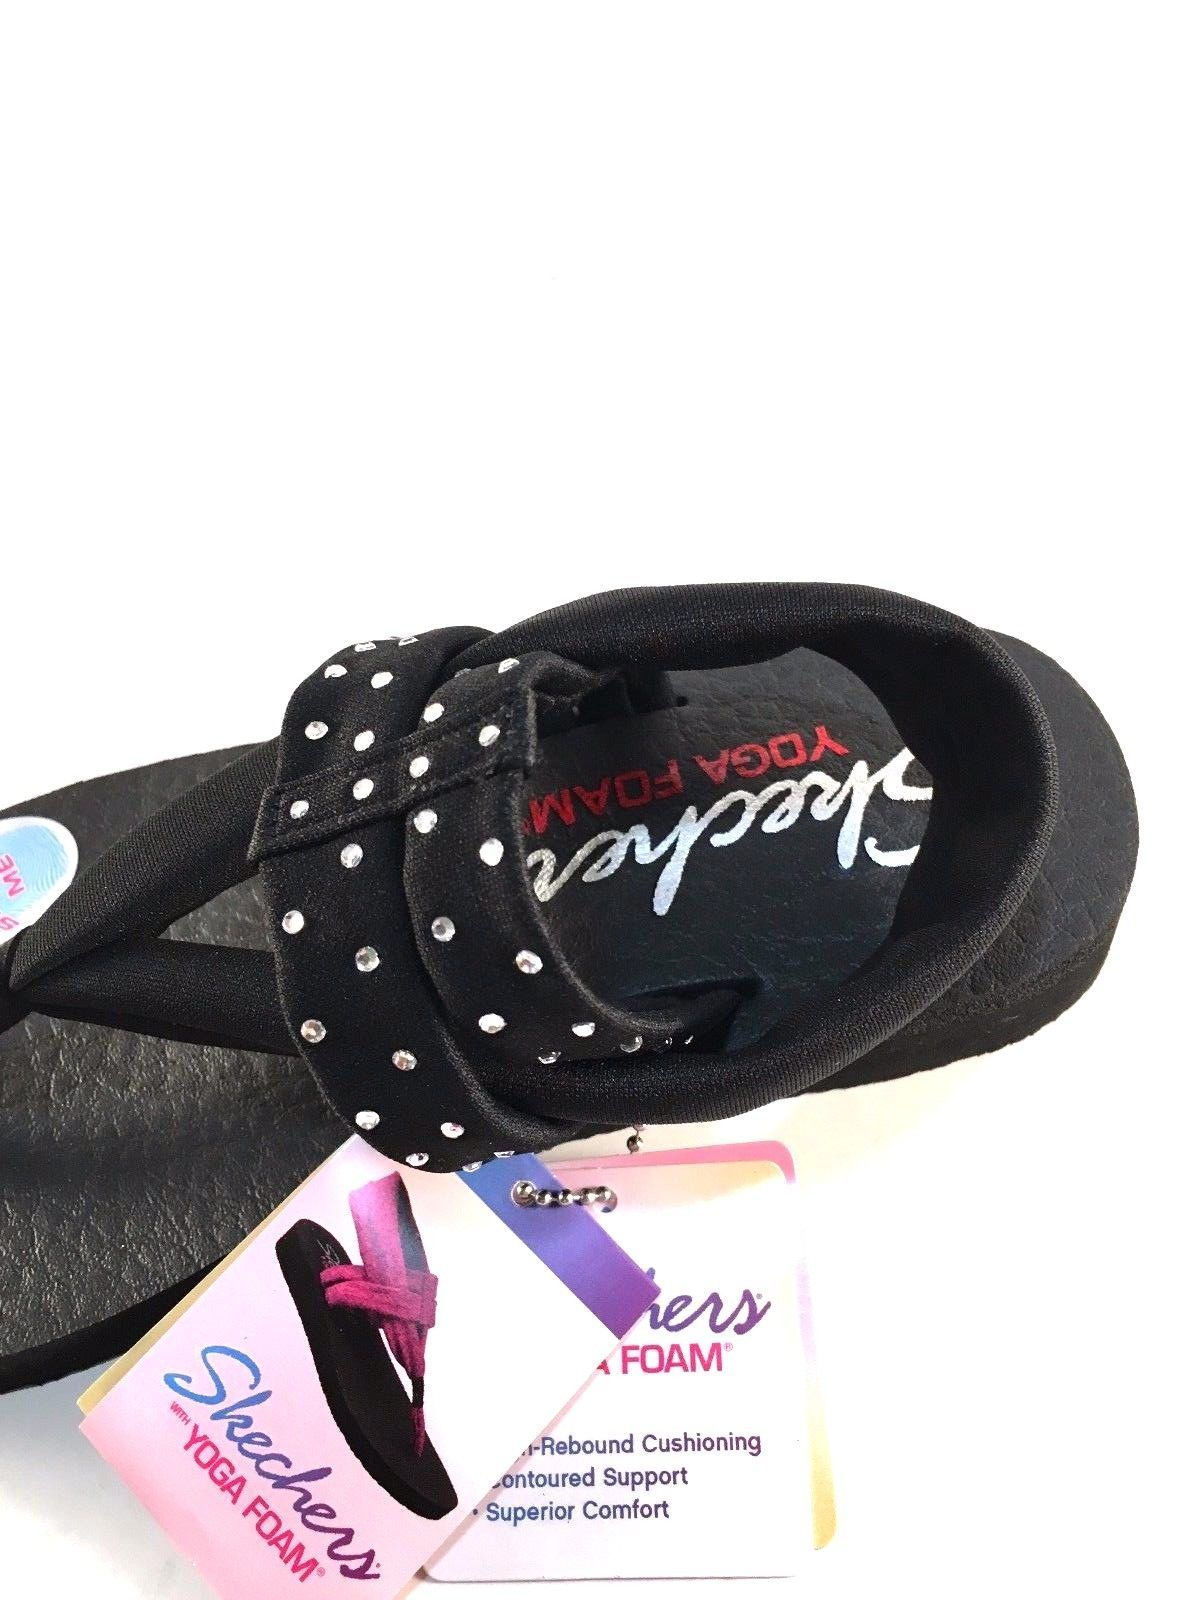 a9bd21870fe Skechers 38612 Black Yoga Foam Thong Sandals and 50 similar items